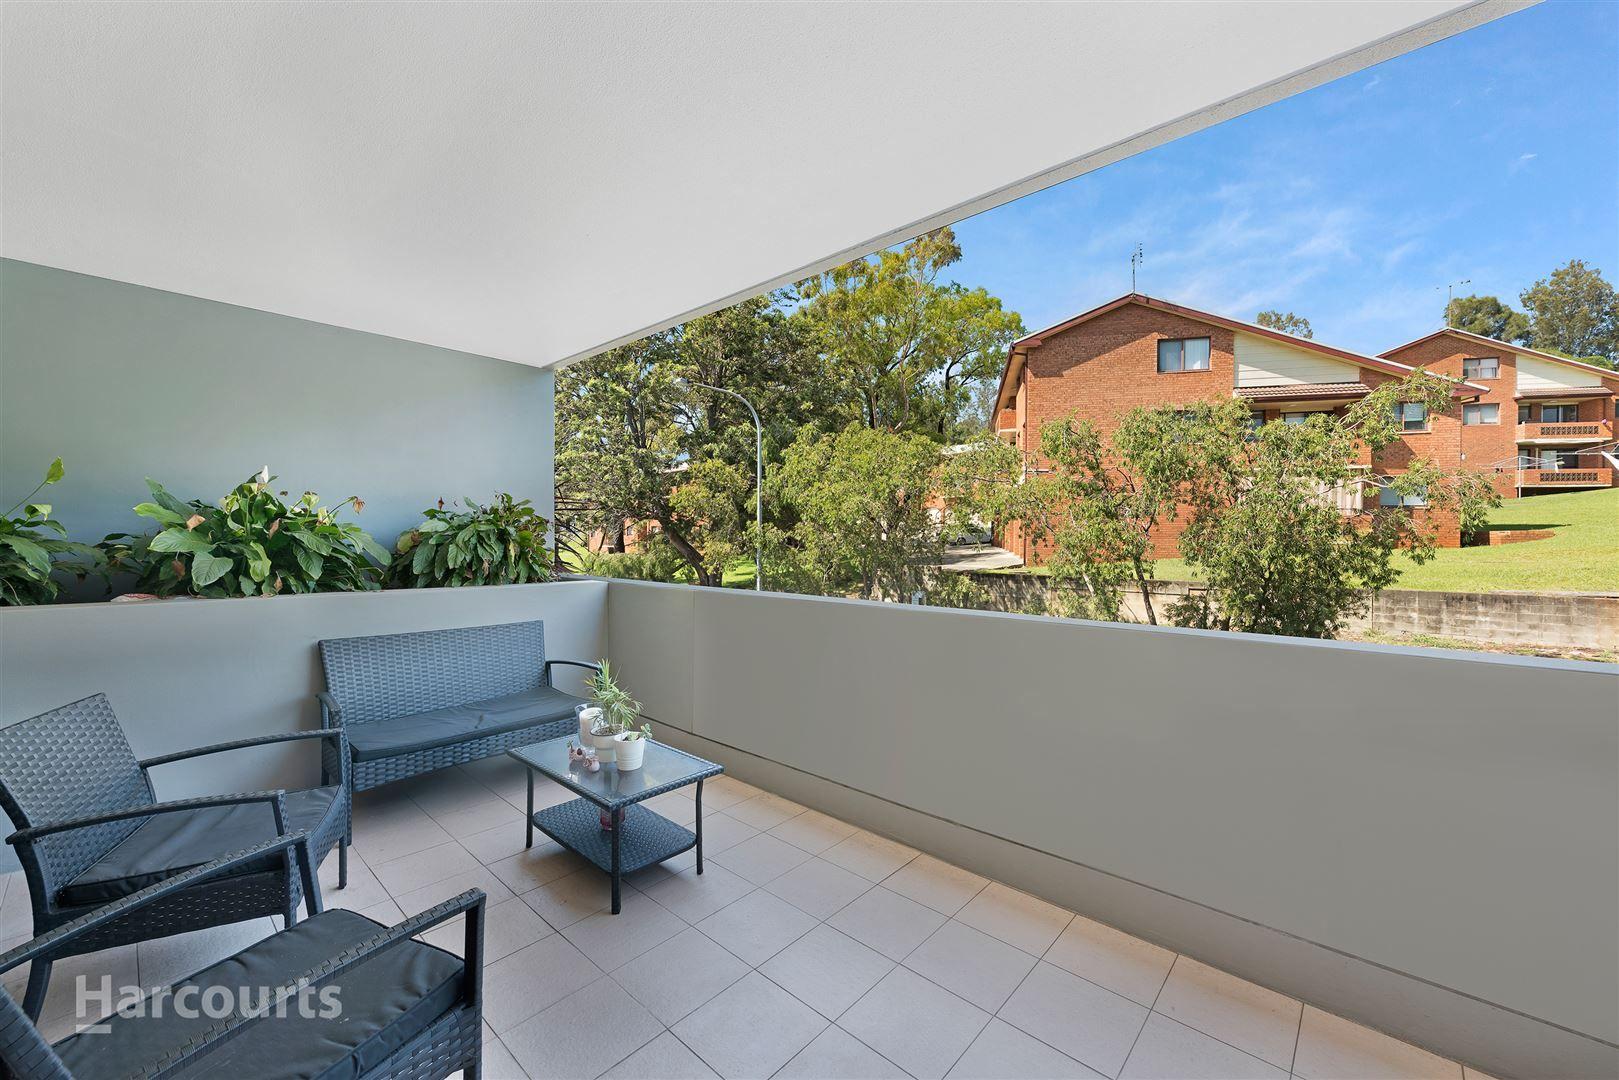 10/124 Terralong Street, Kiama NSW 2533, Image 0